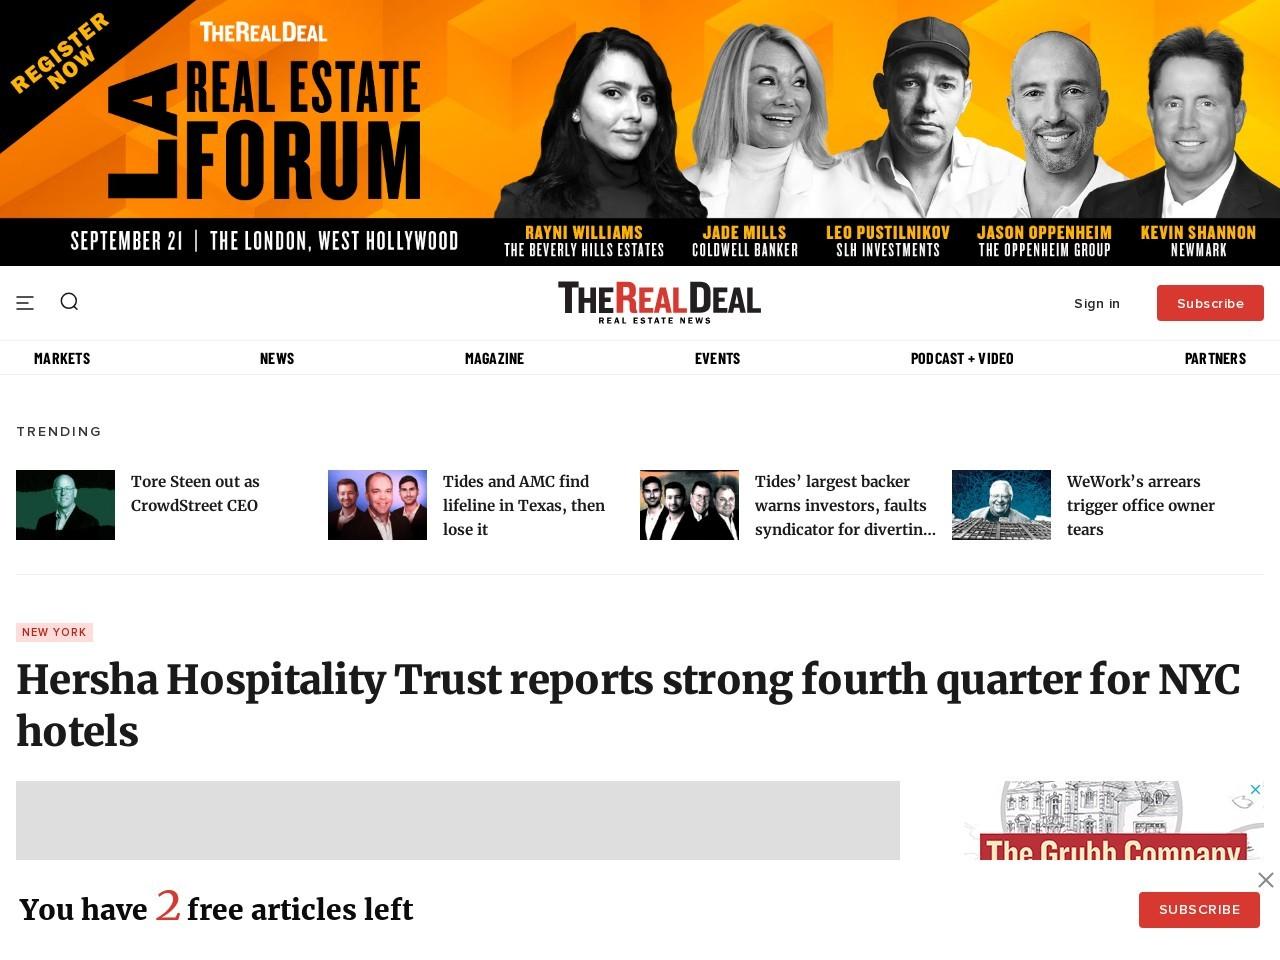 Hersha Hospitality Trust | Hurricane Sandy 2012